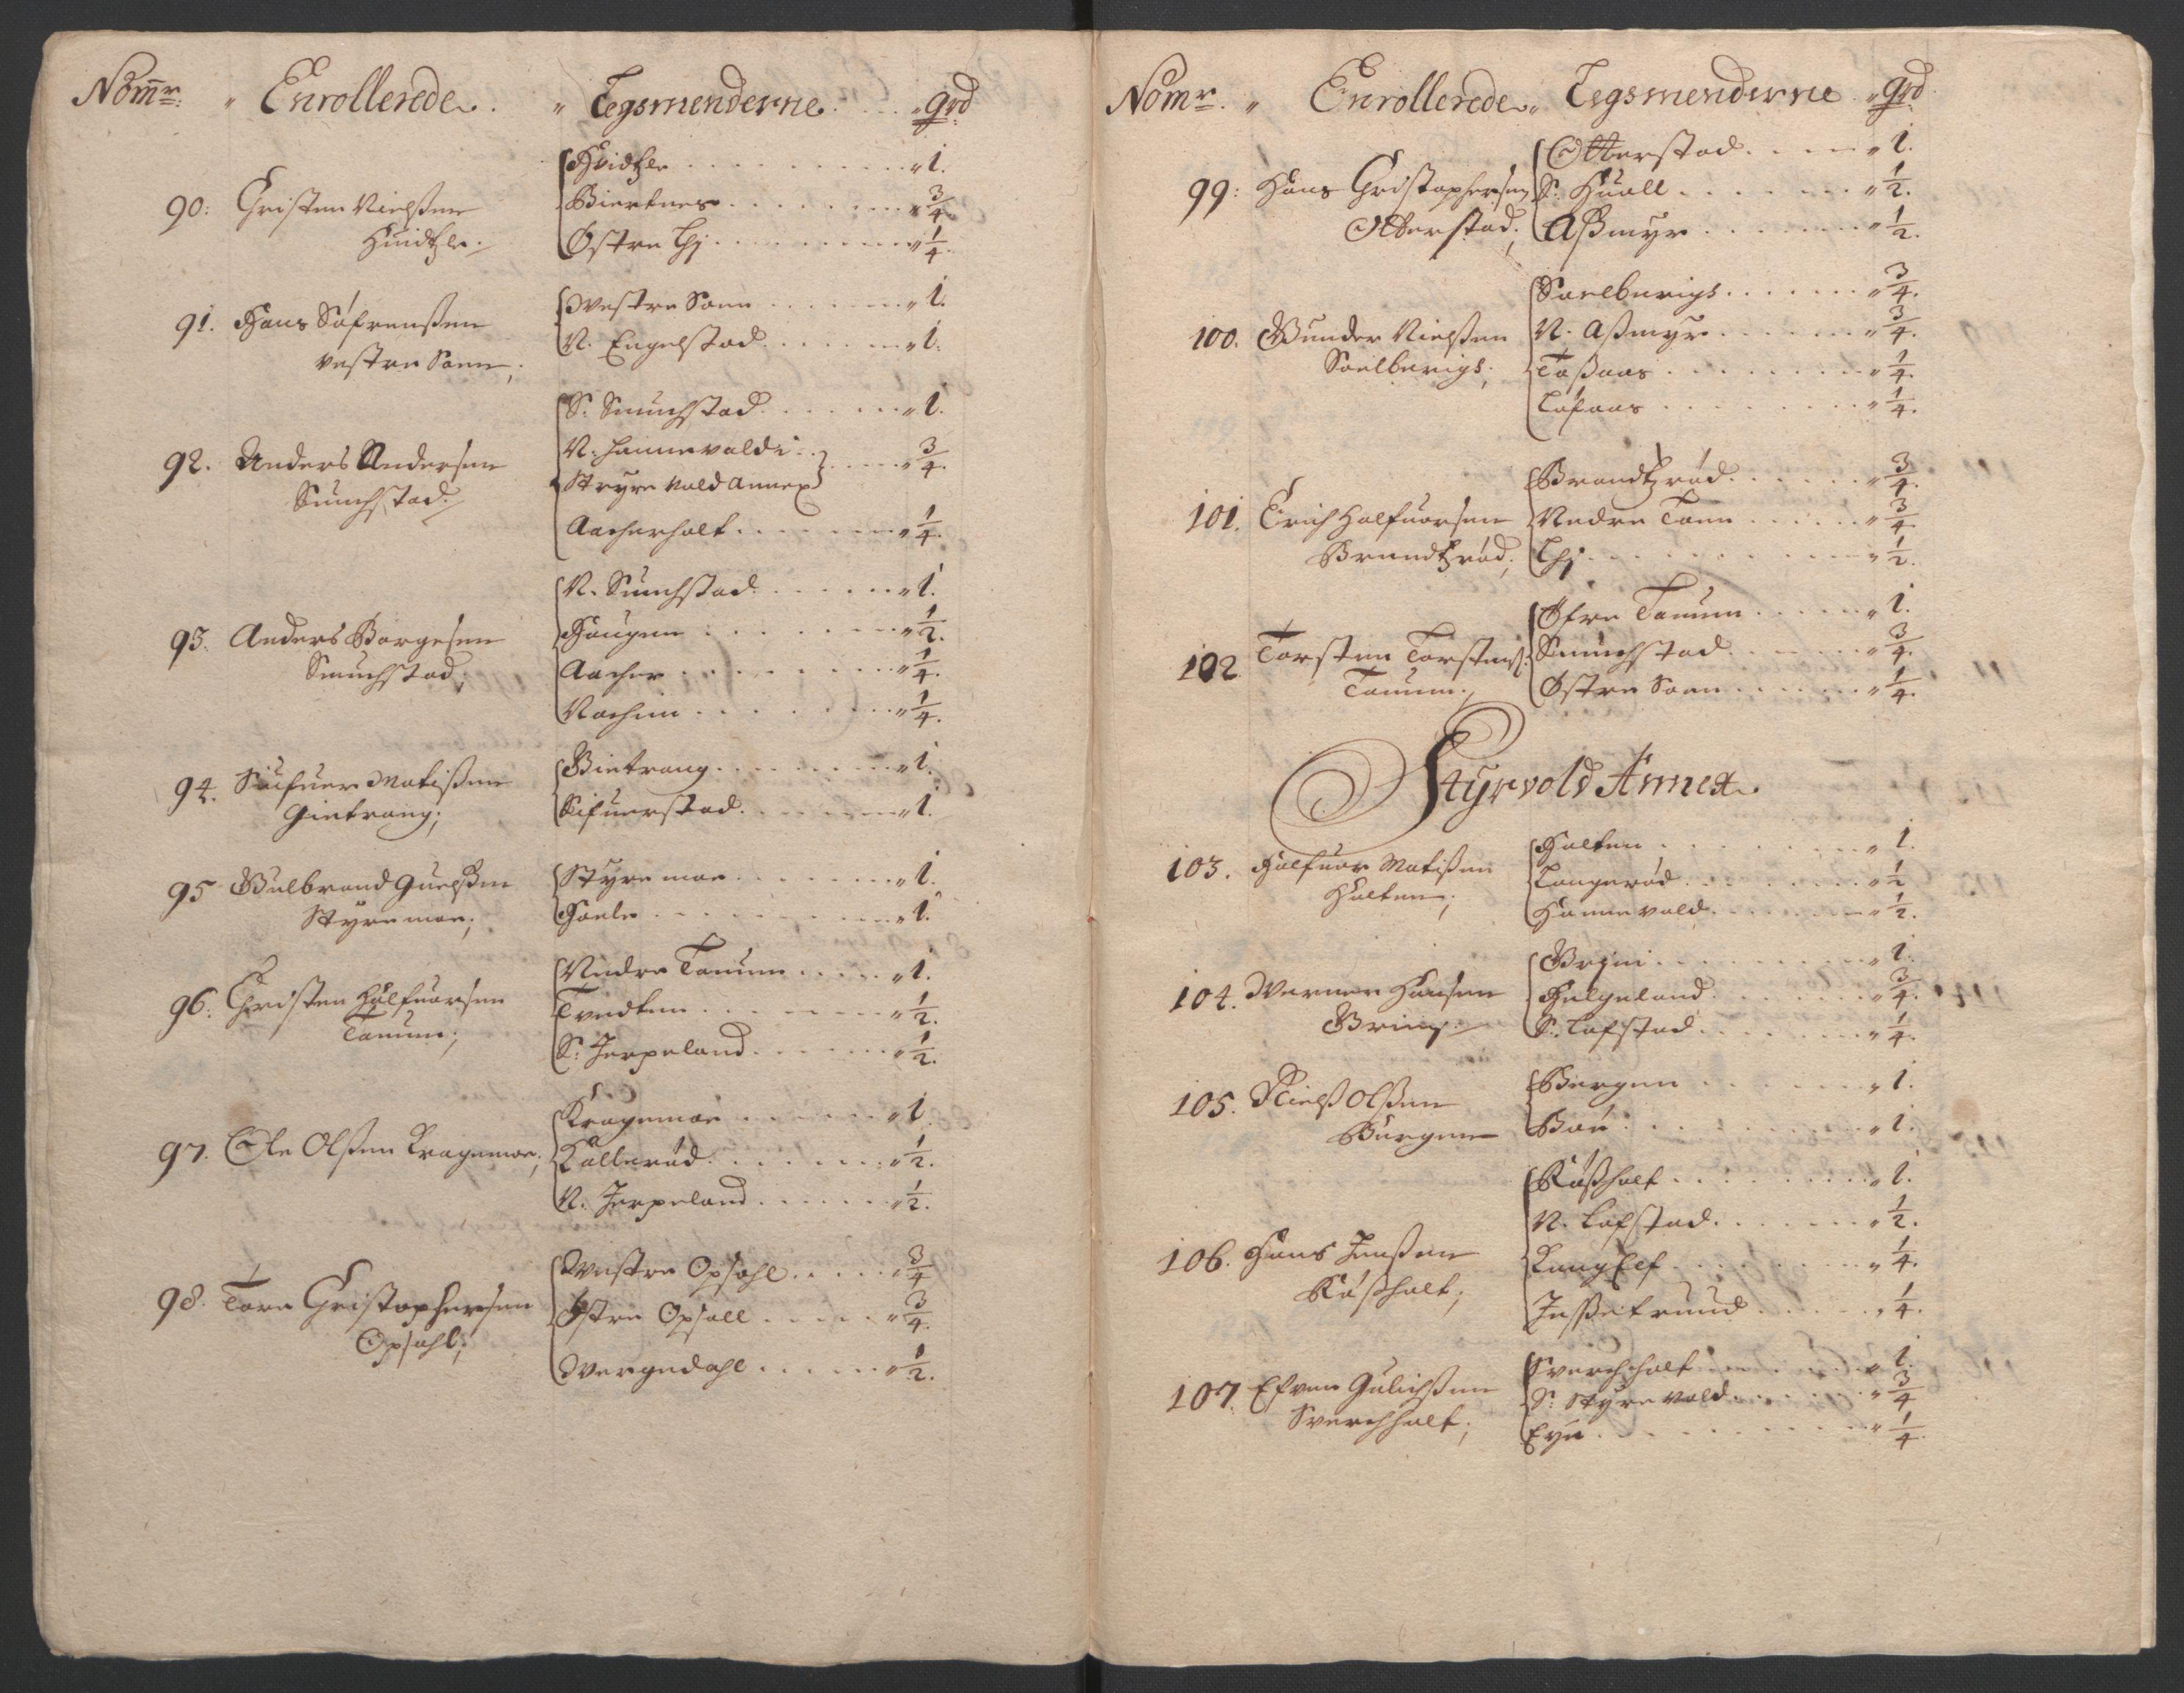 RA, Rentekammeret inntil 1814, Reviderte regnskaper, Fogderegnskap, R32/L1865: Fogderegnskap Jarlsberg grevskap, 1692, s. 225